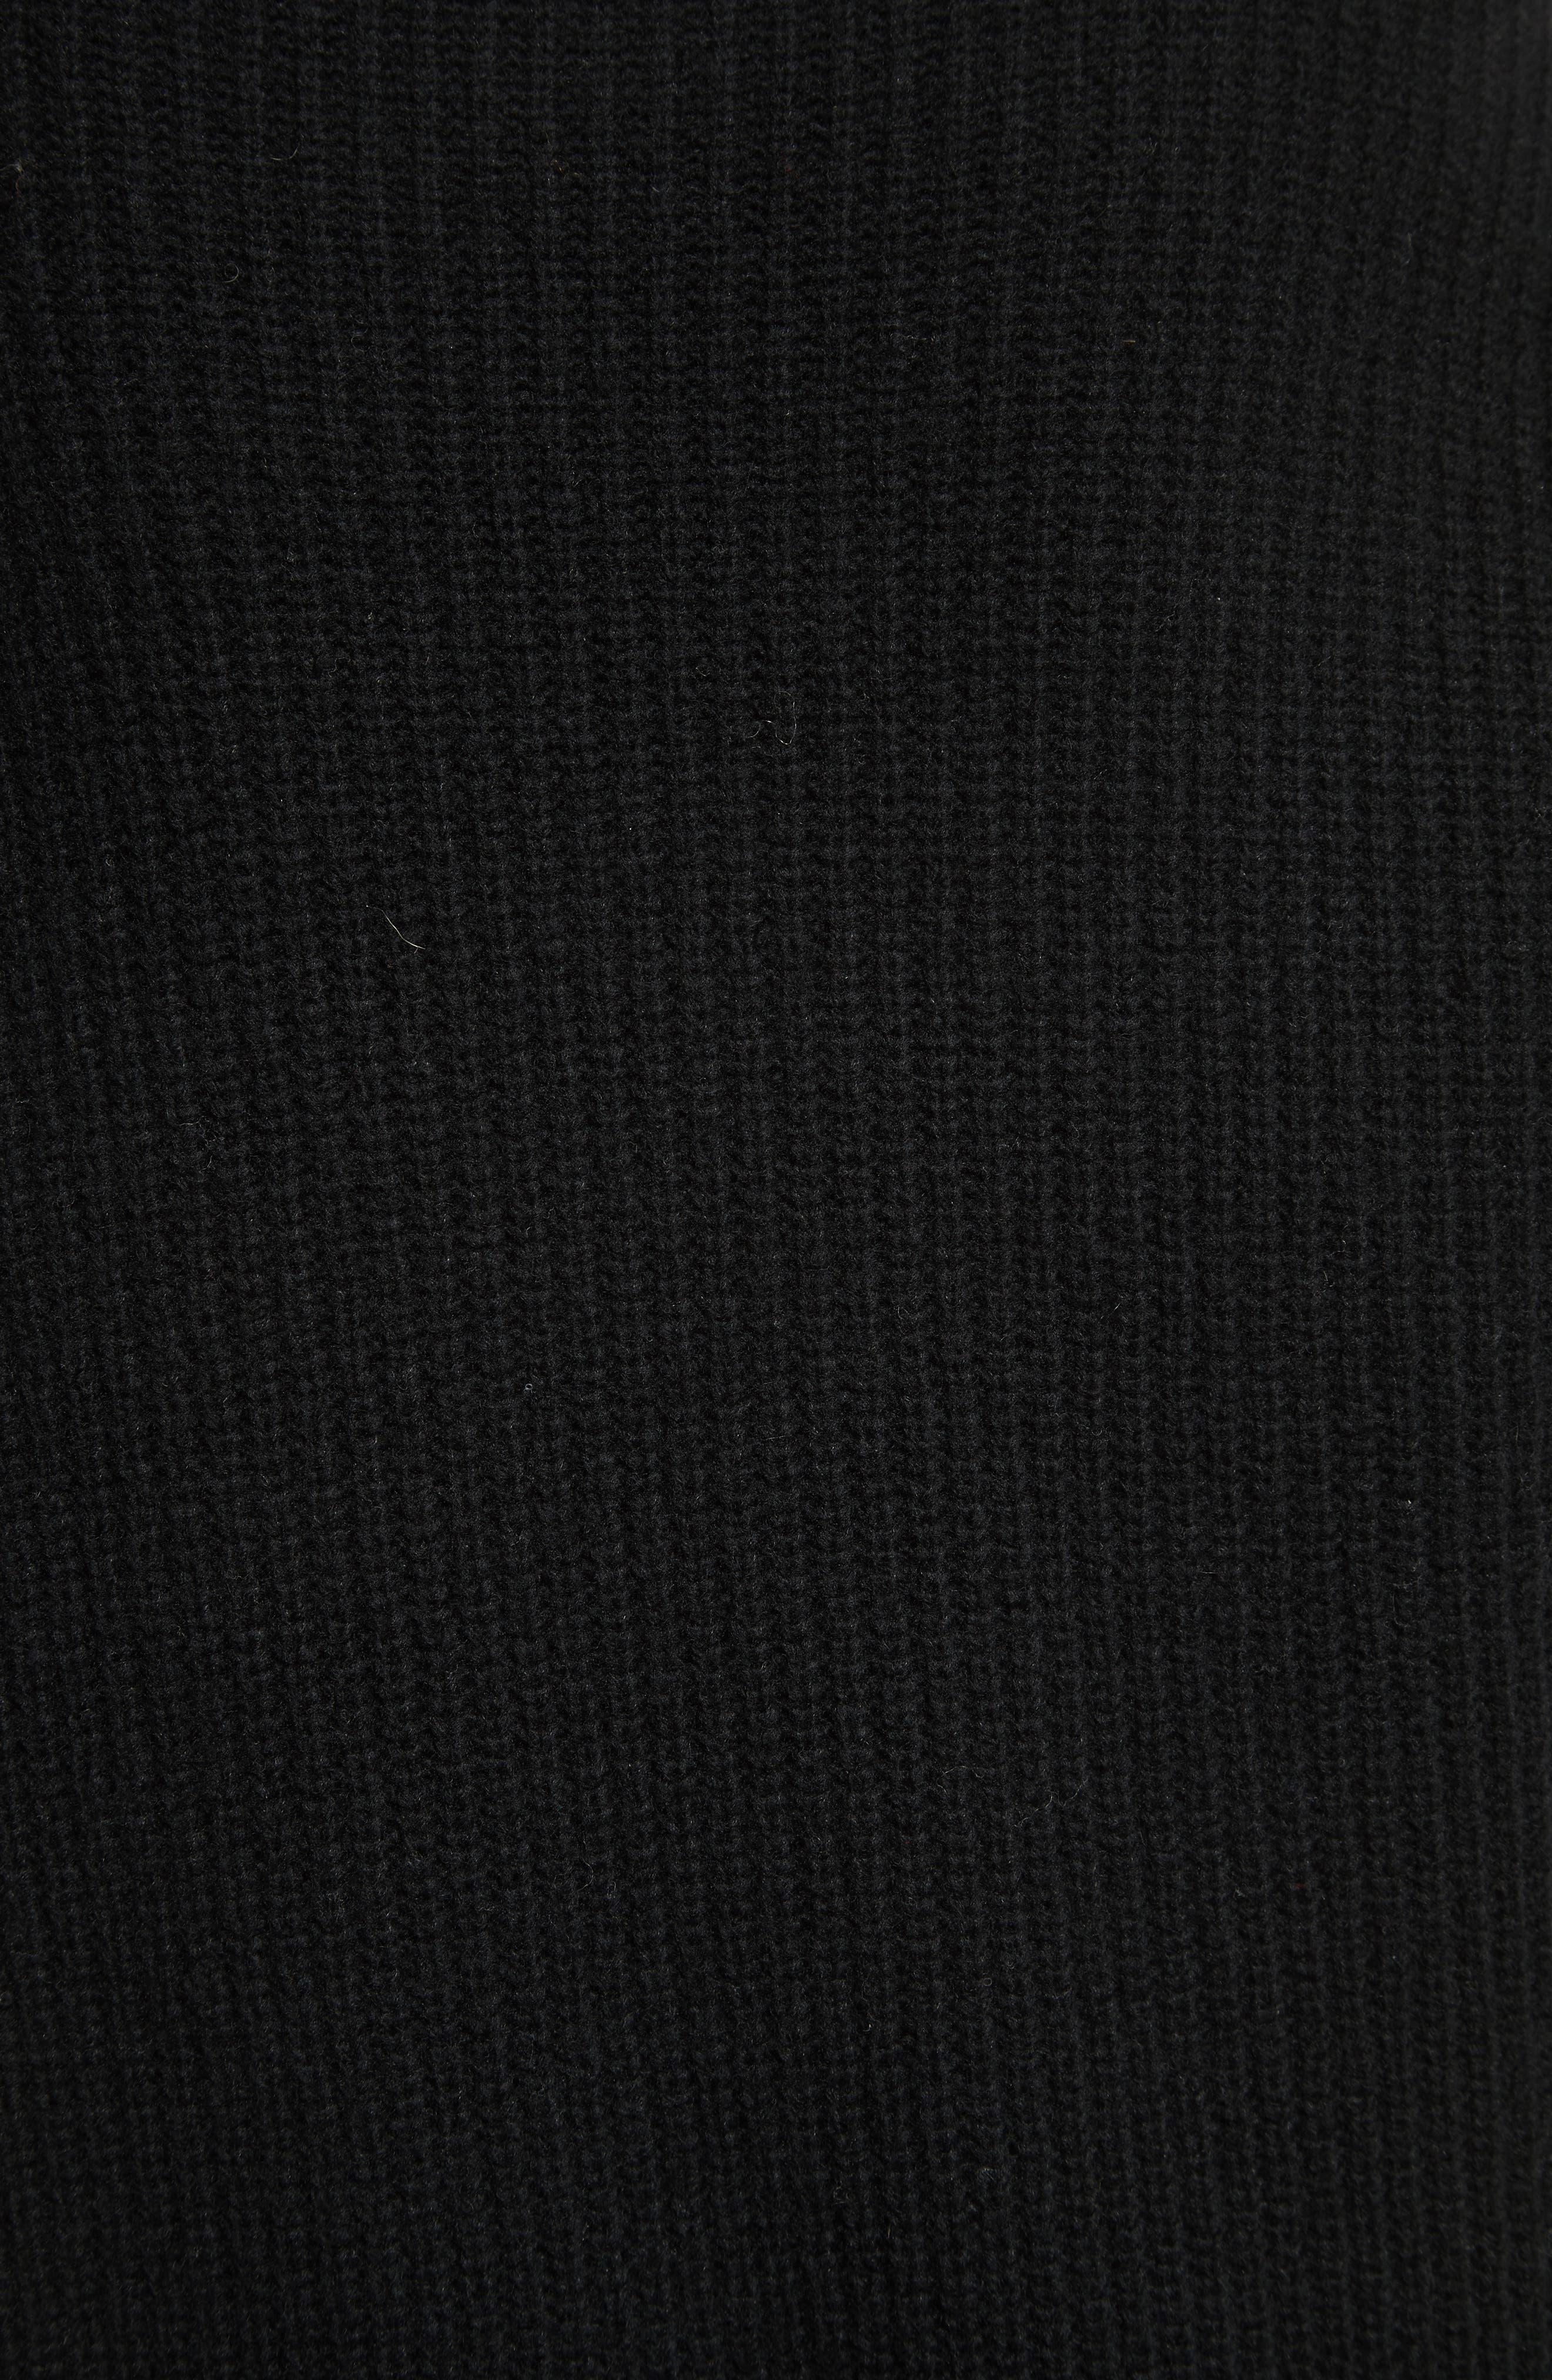 Nimbus Wool Ribbed Cocoon Dress,                             Alternate thumbnail 5, color,                             001